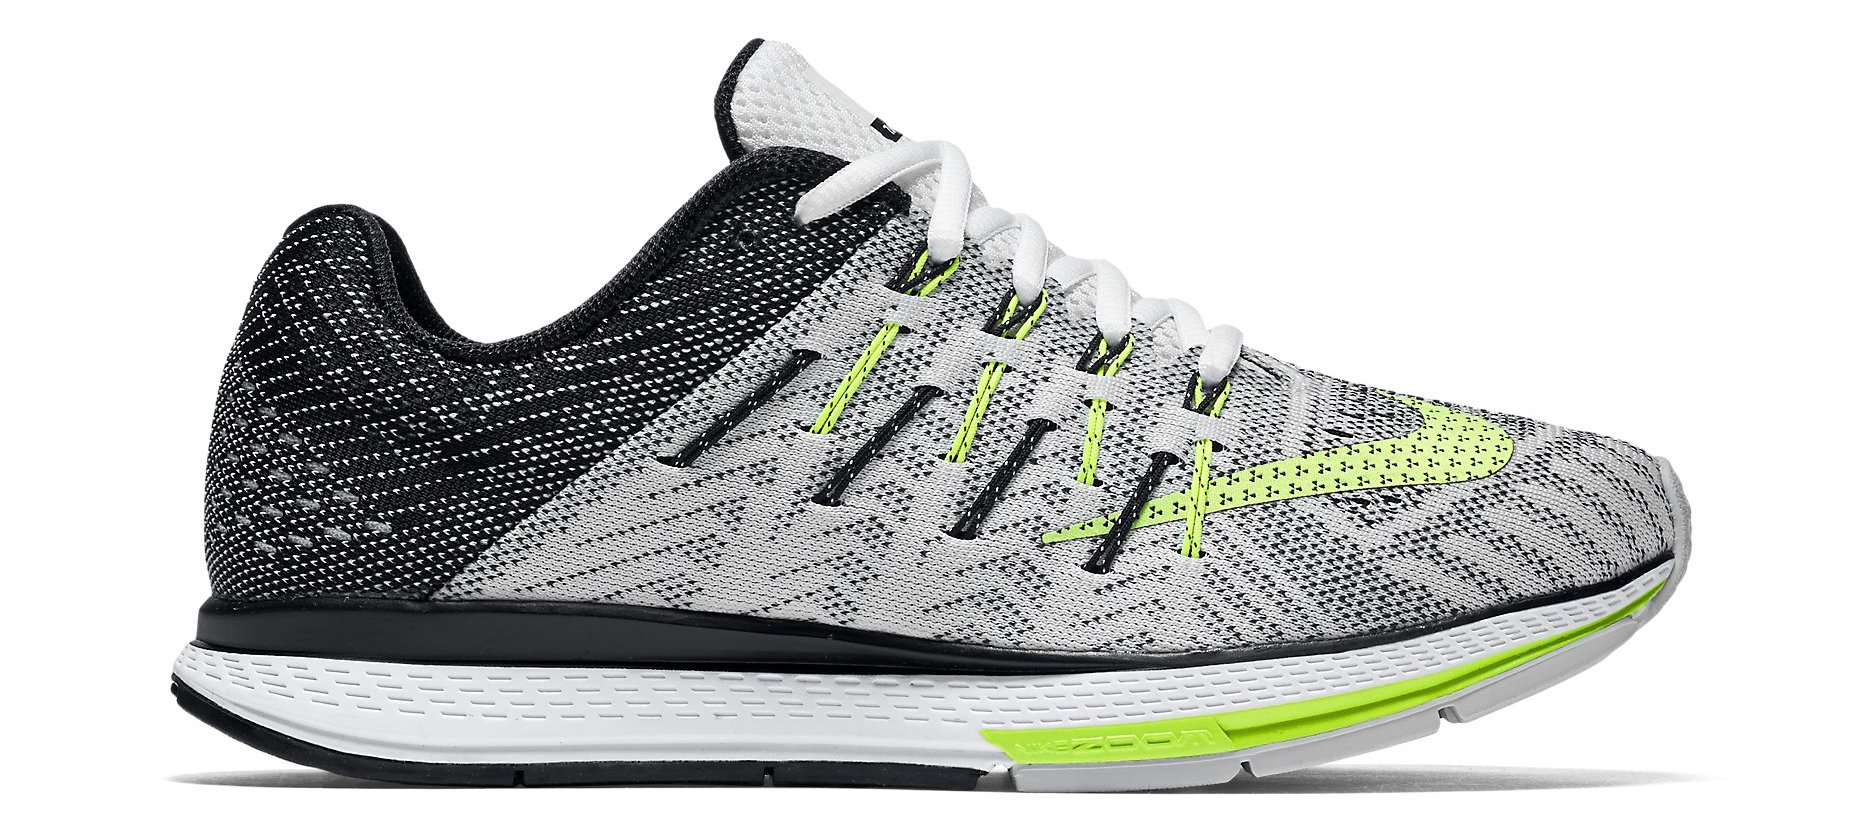 Běžecké boty Nike WMNS AIR ZOOM ELITE 8 CP